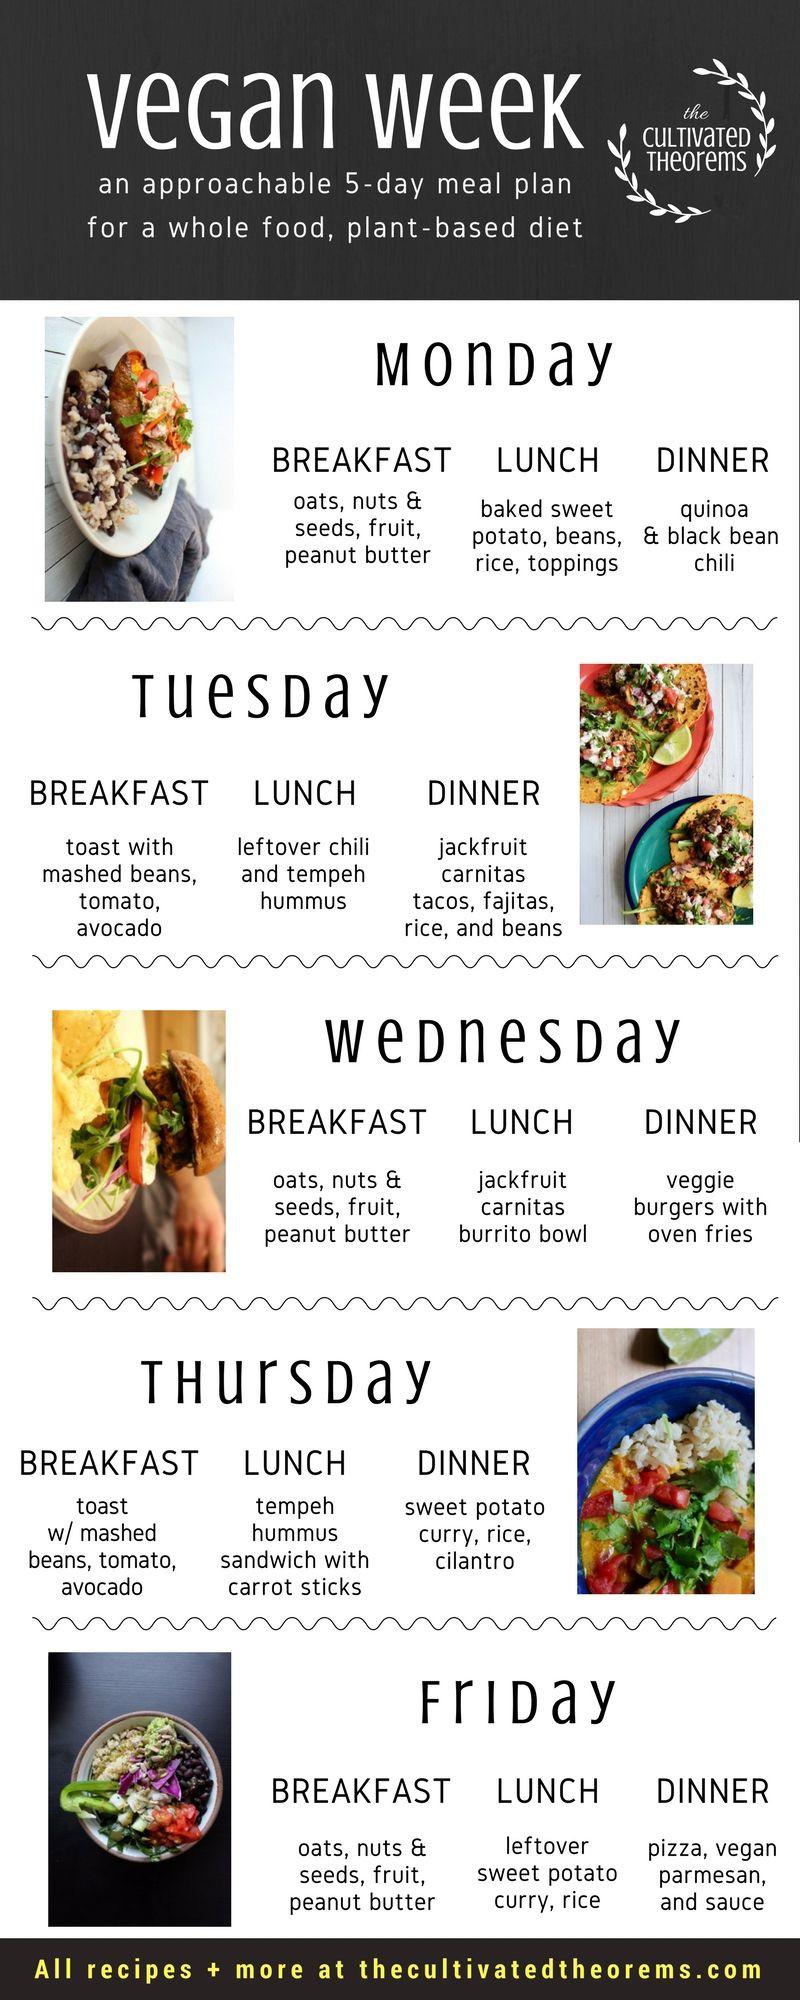 Easy Vegan Plan  5 day easy vegan meal plan for beginners in 2019